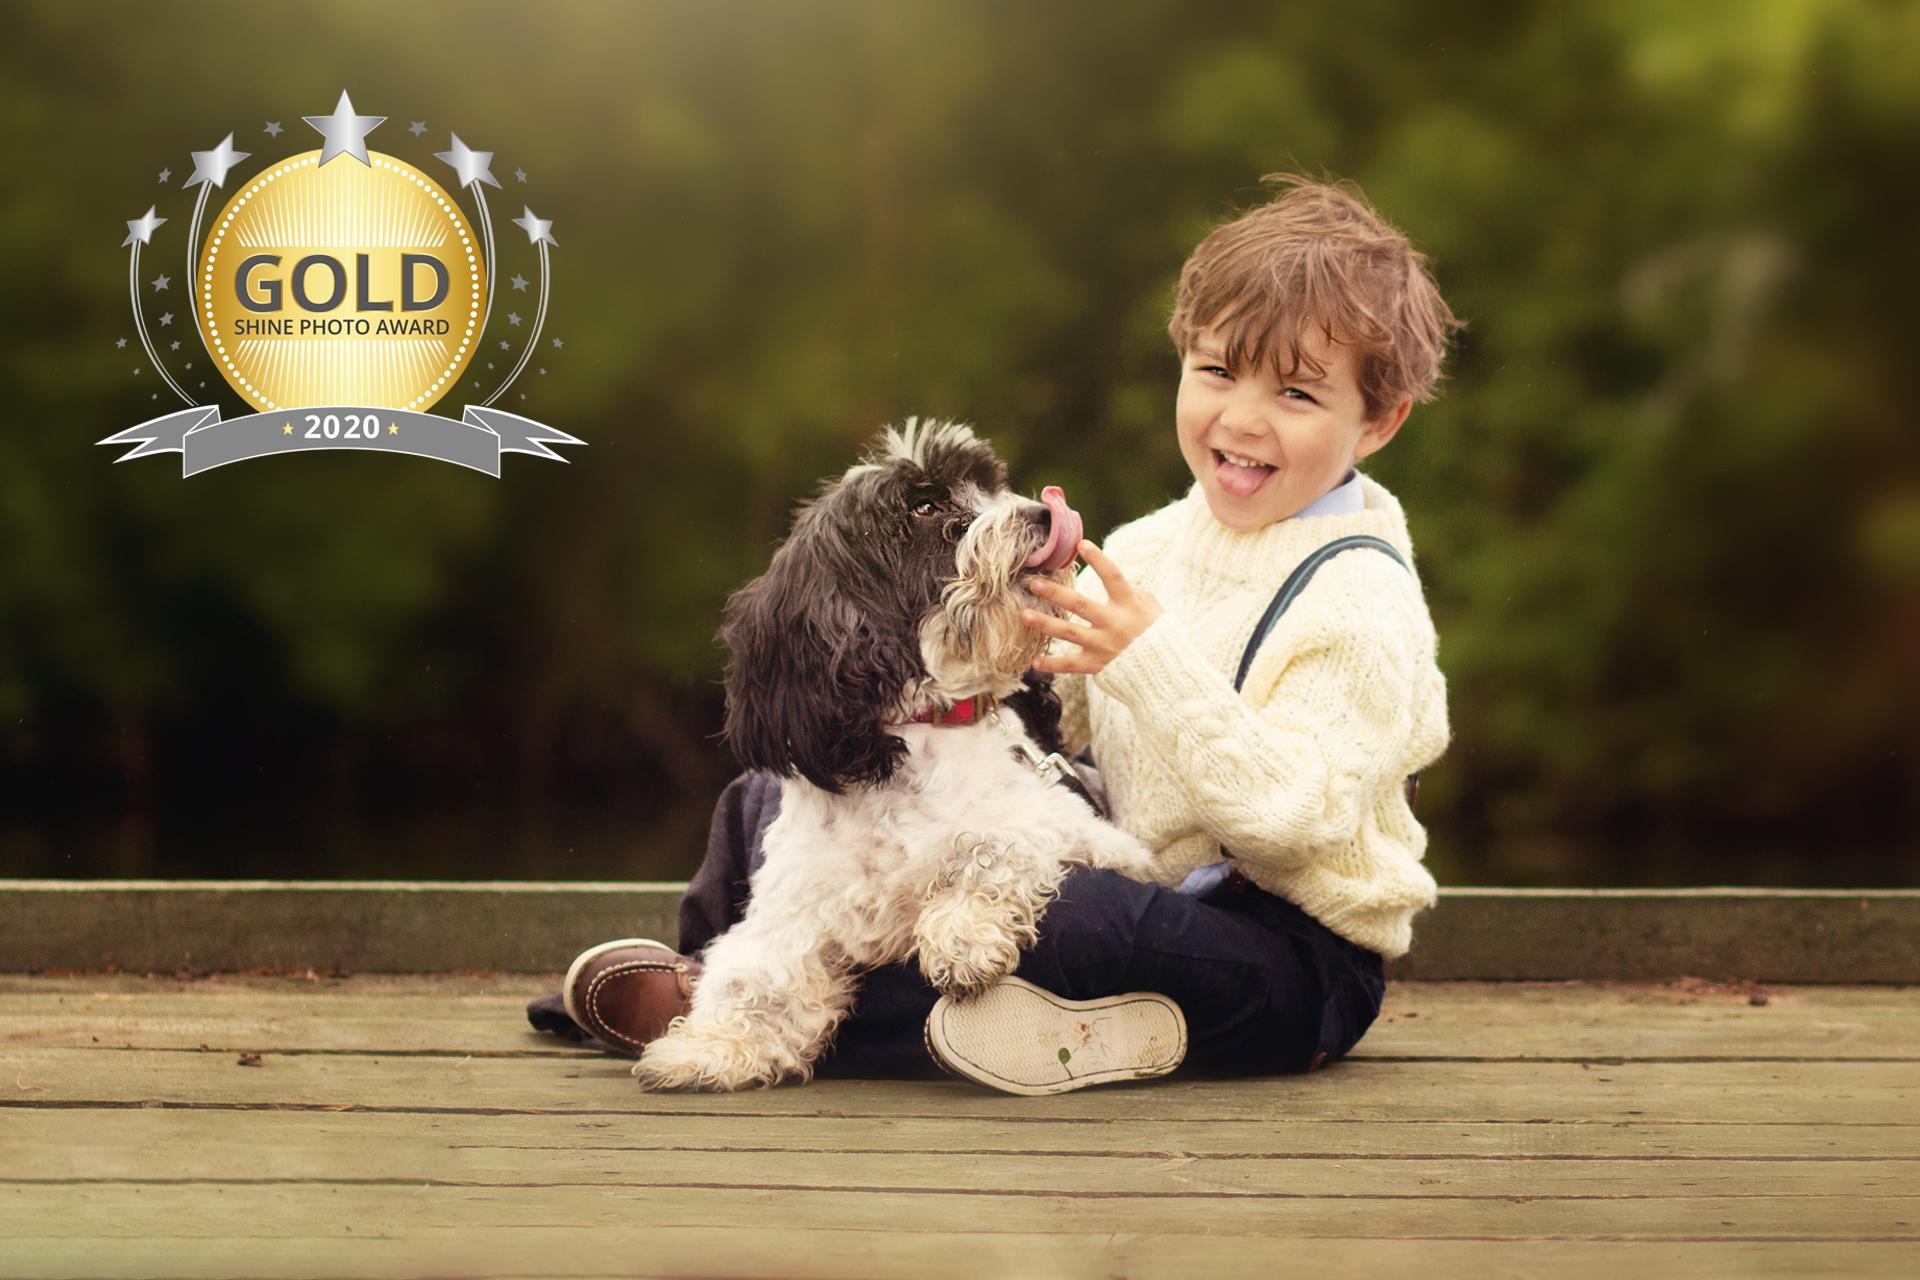 SHINE Photo Award - Gold Winner Child & Family